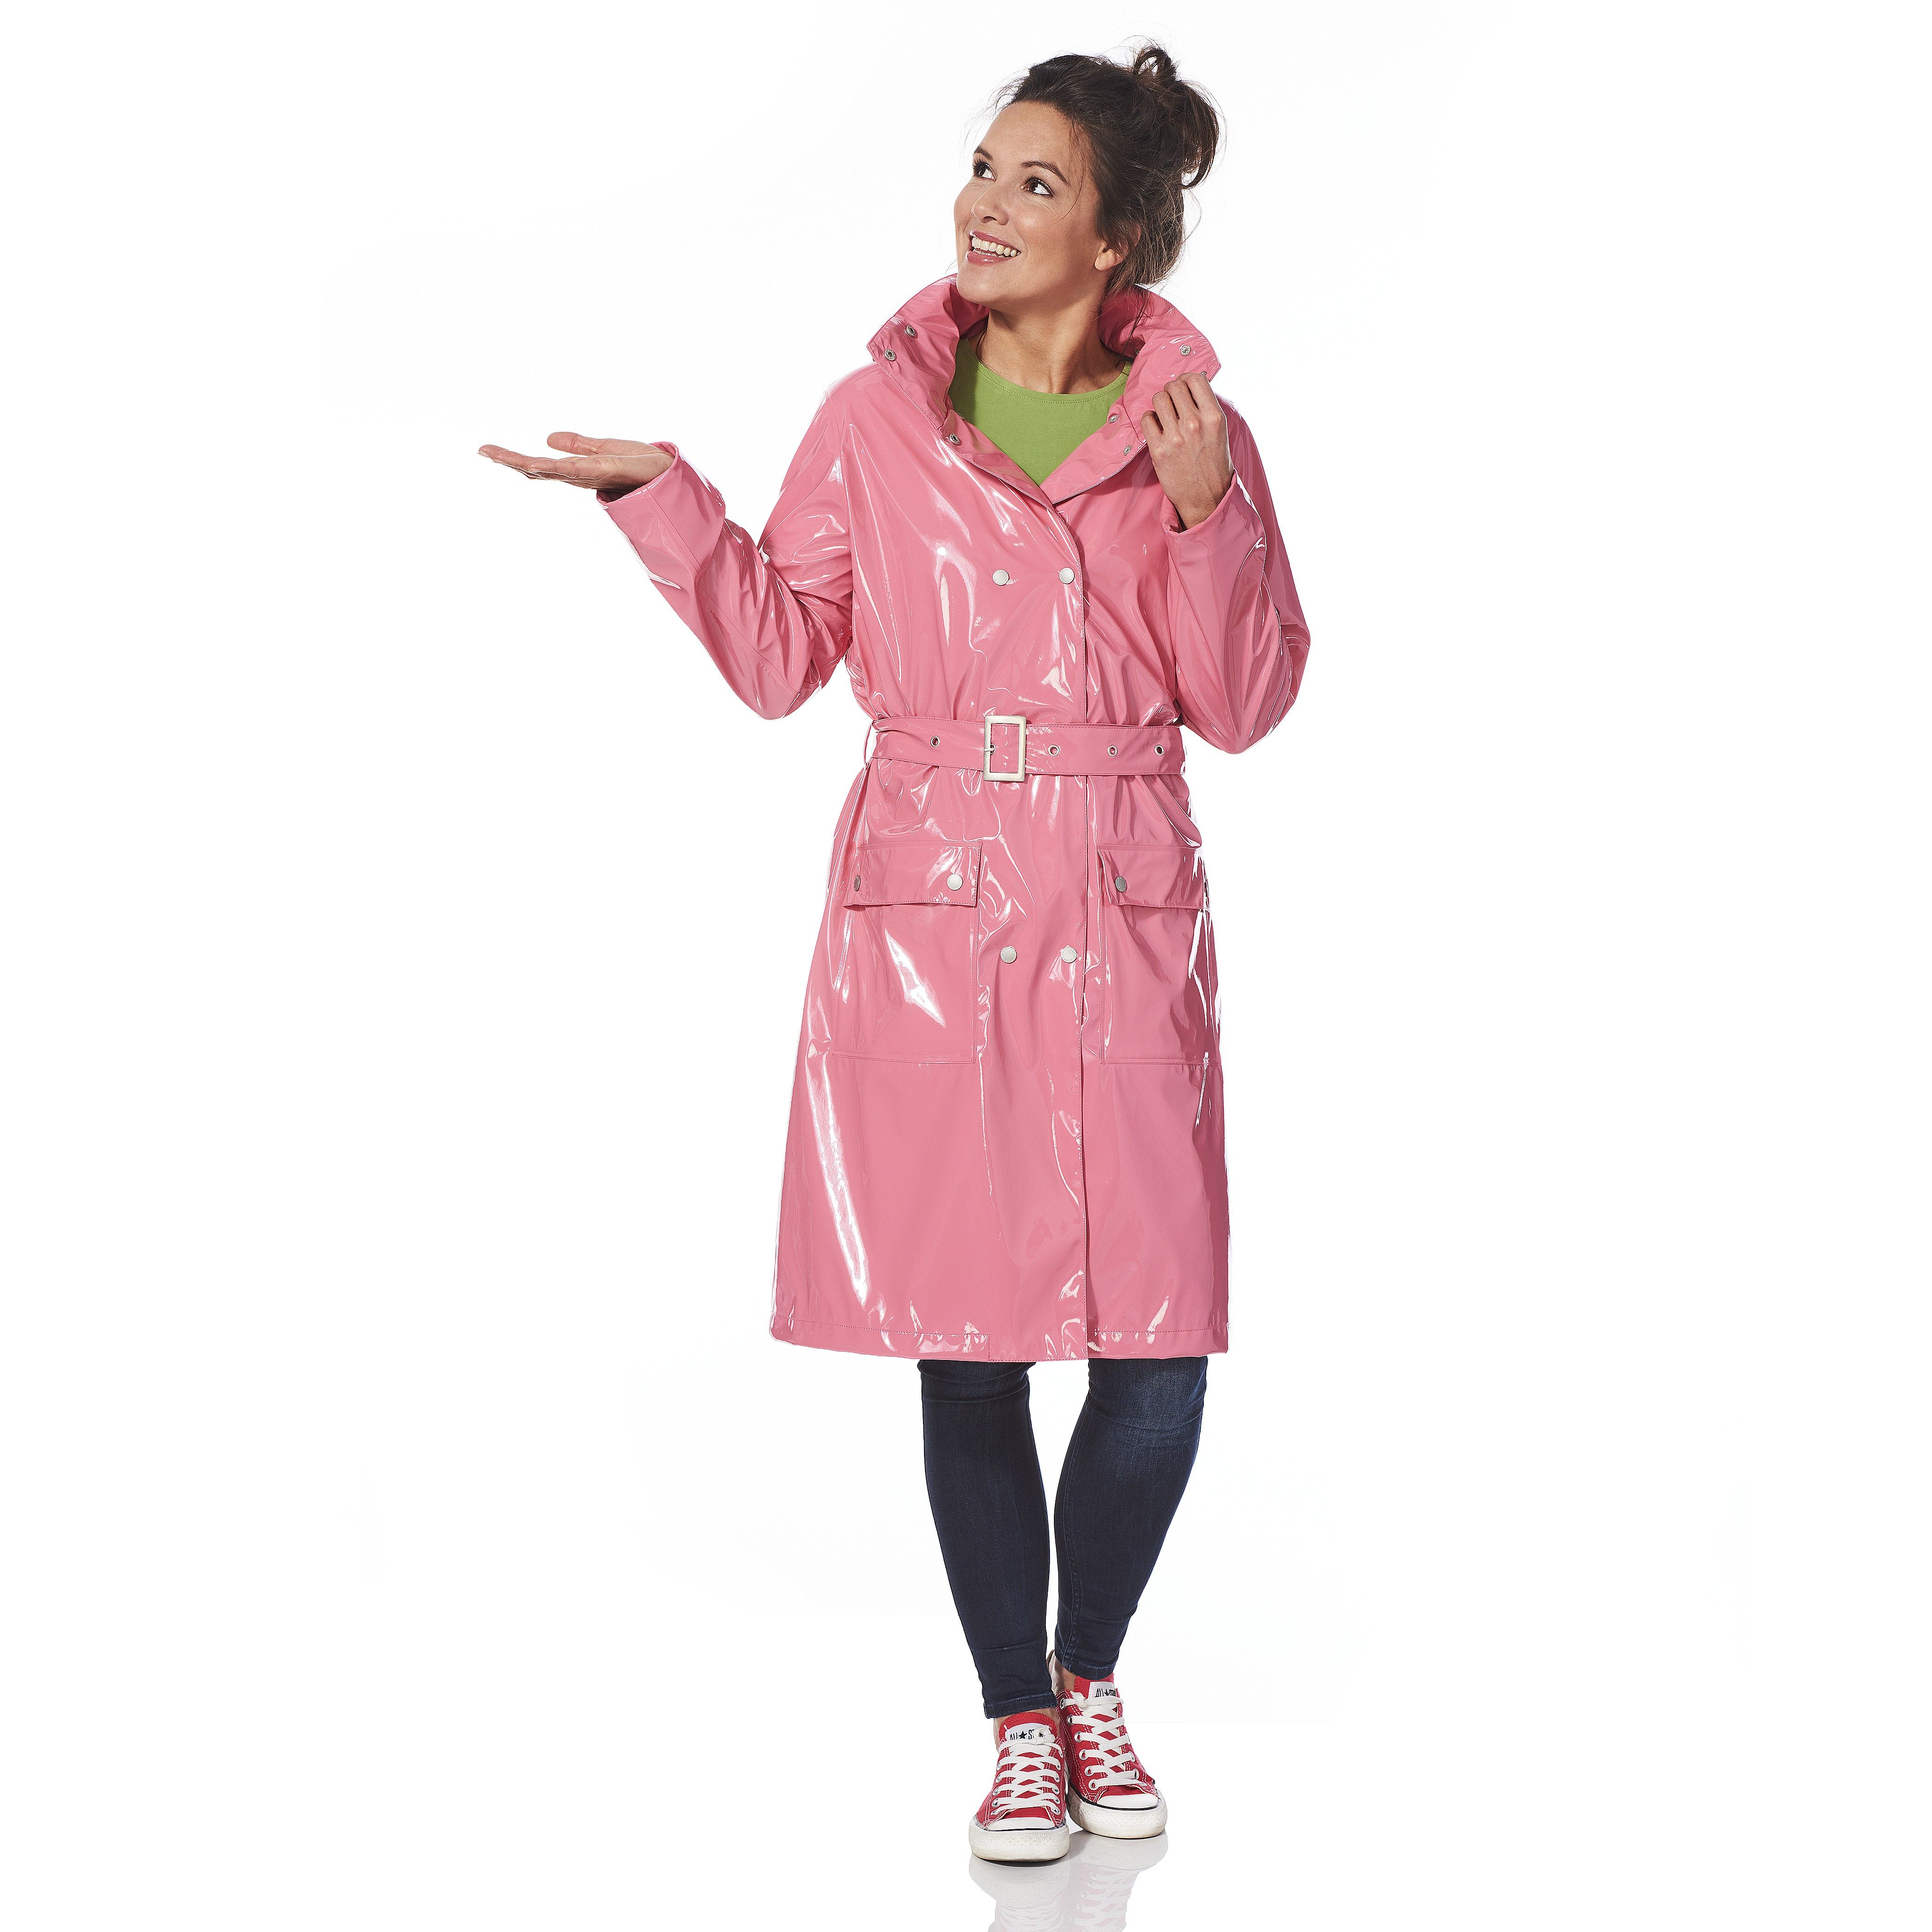 Langer Lackmantel Paula pink | lakk mantel | Pinterest | Regenmantel ...